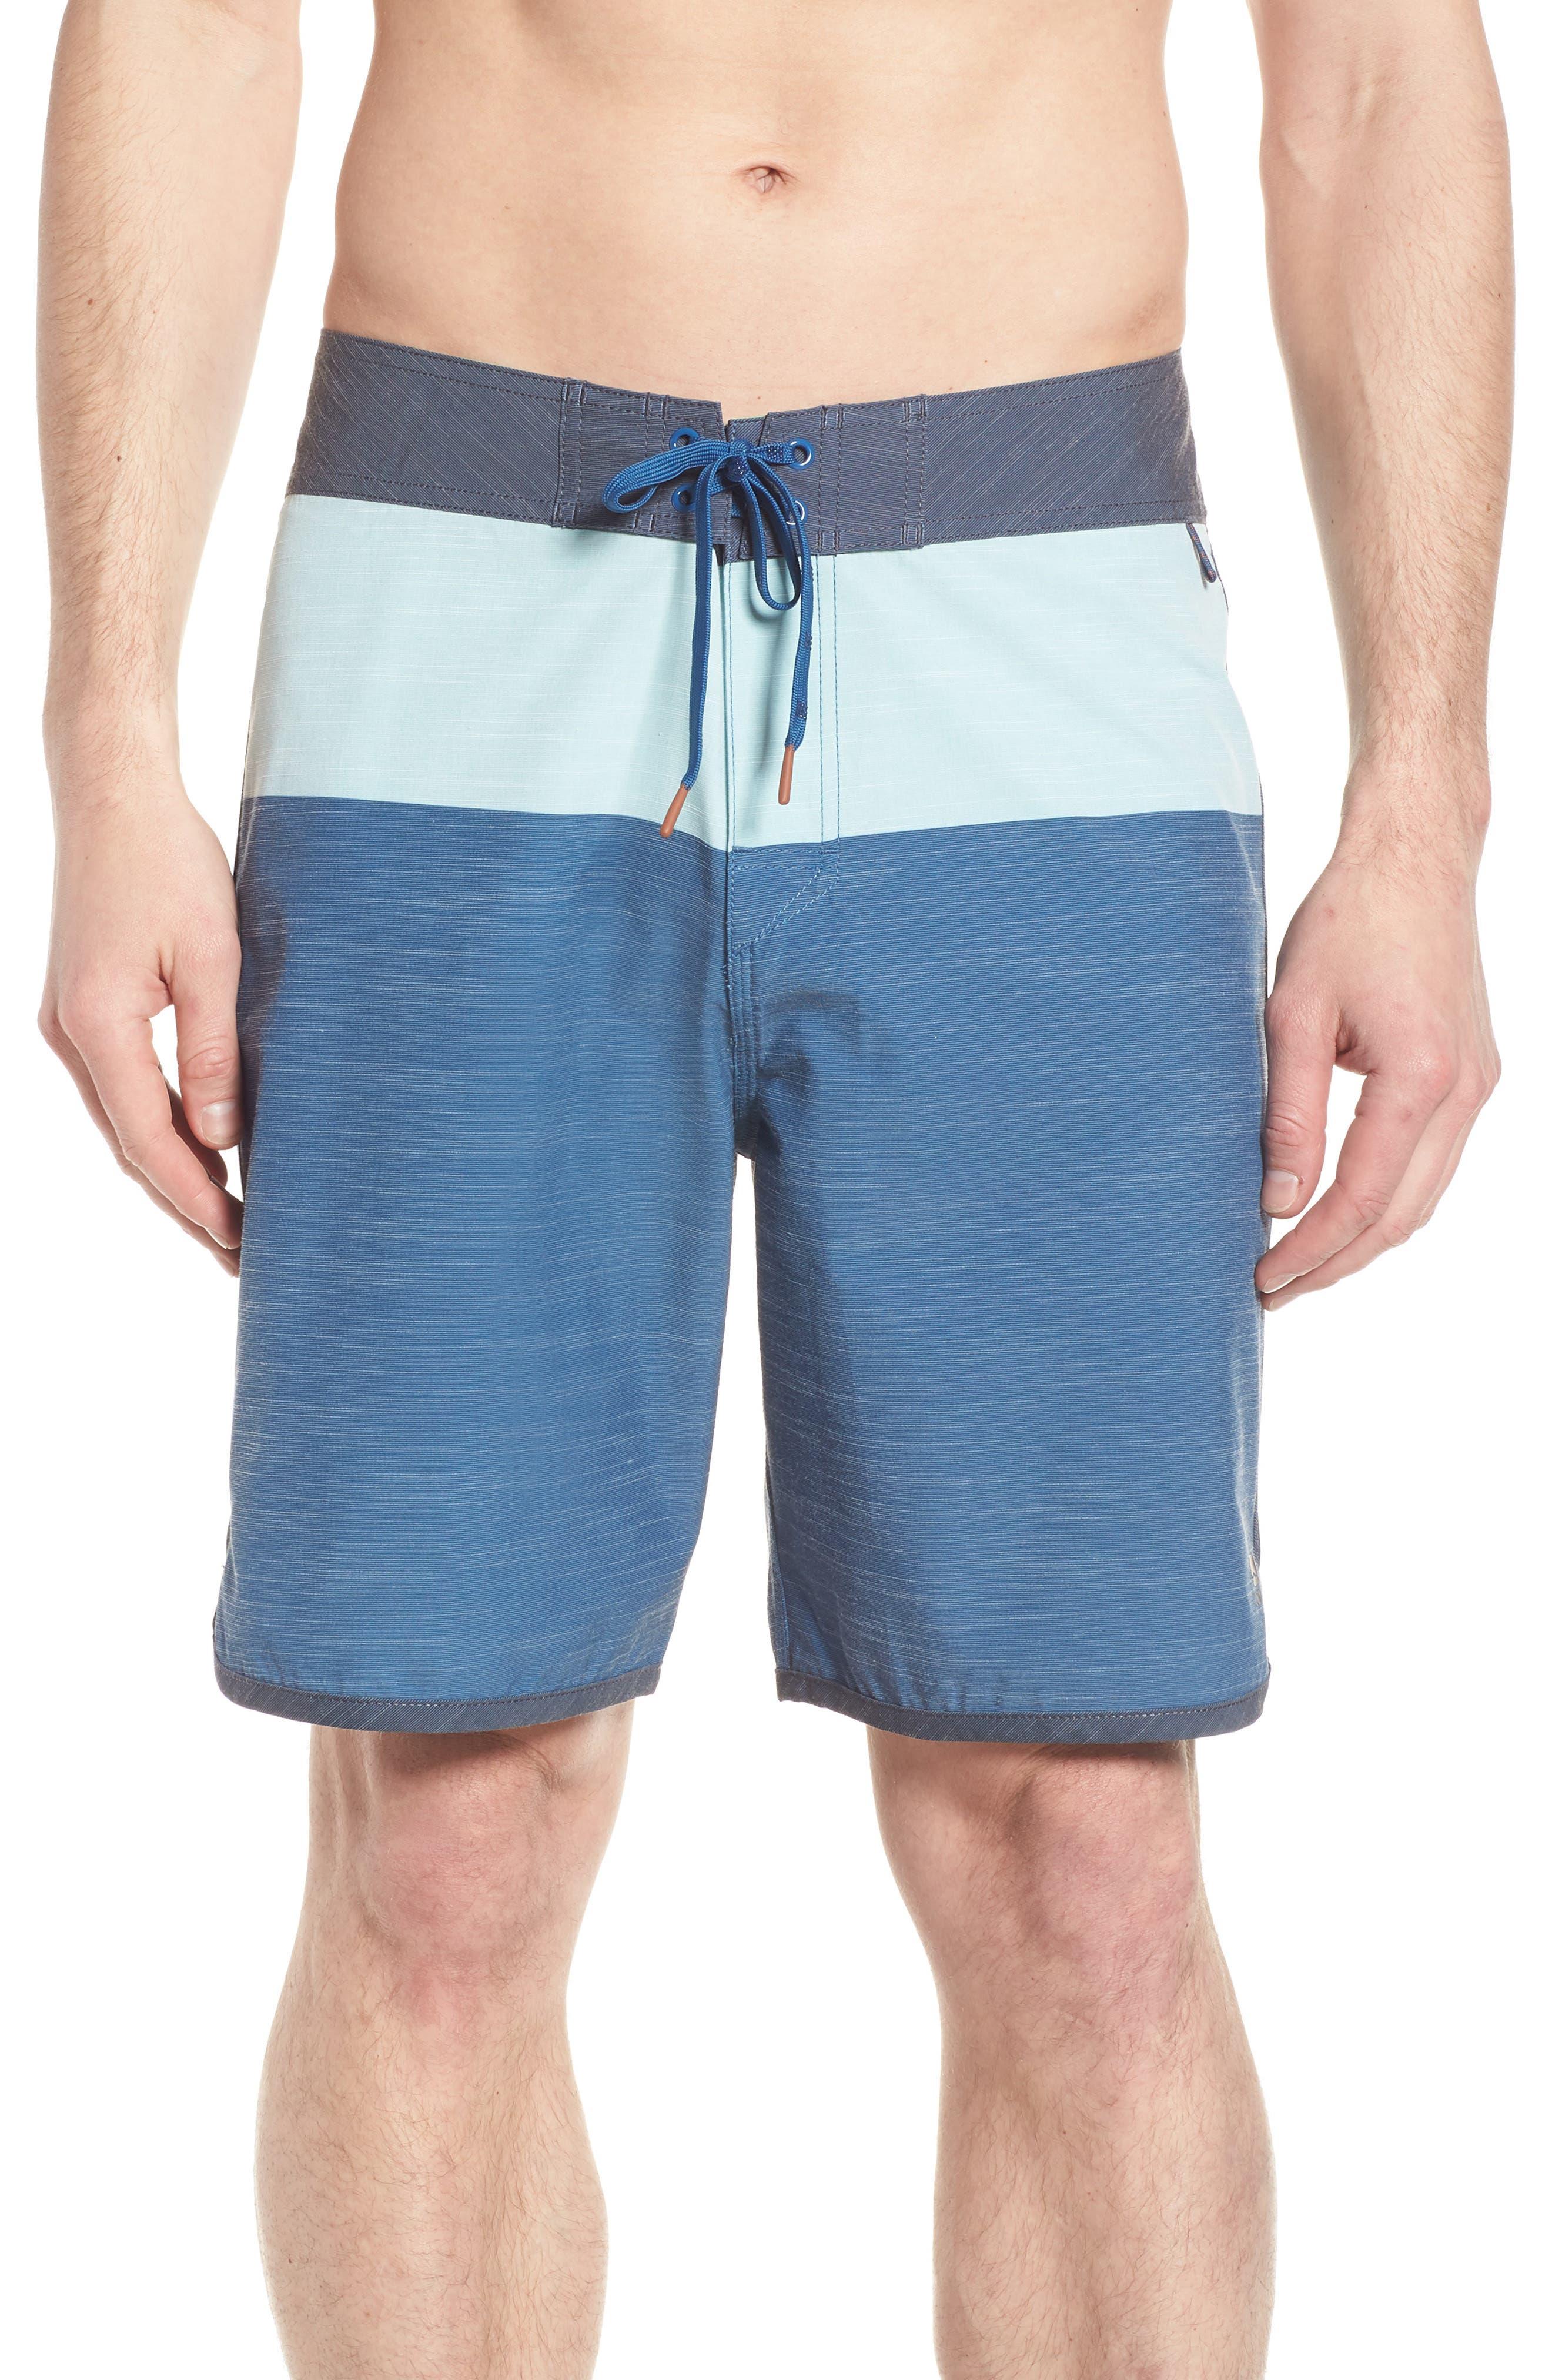 Beachcomber Board Shorts,                         Main,                         color, 423